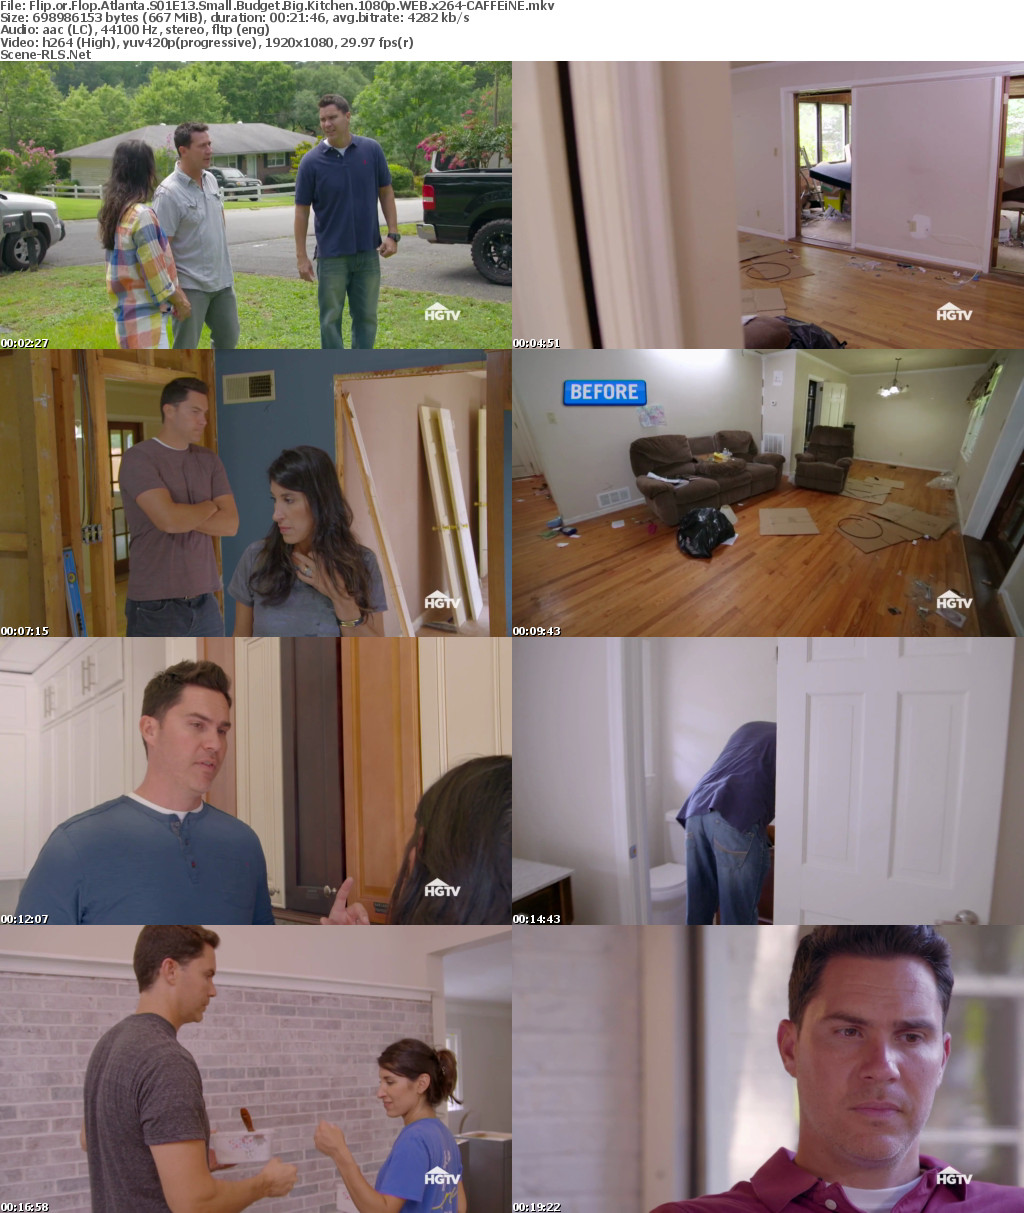 Flip Or Flop Atlanta S01e13 Small Budget Big Kitchen 1080p Web X264